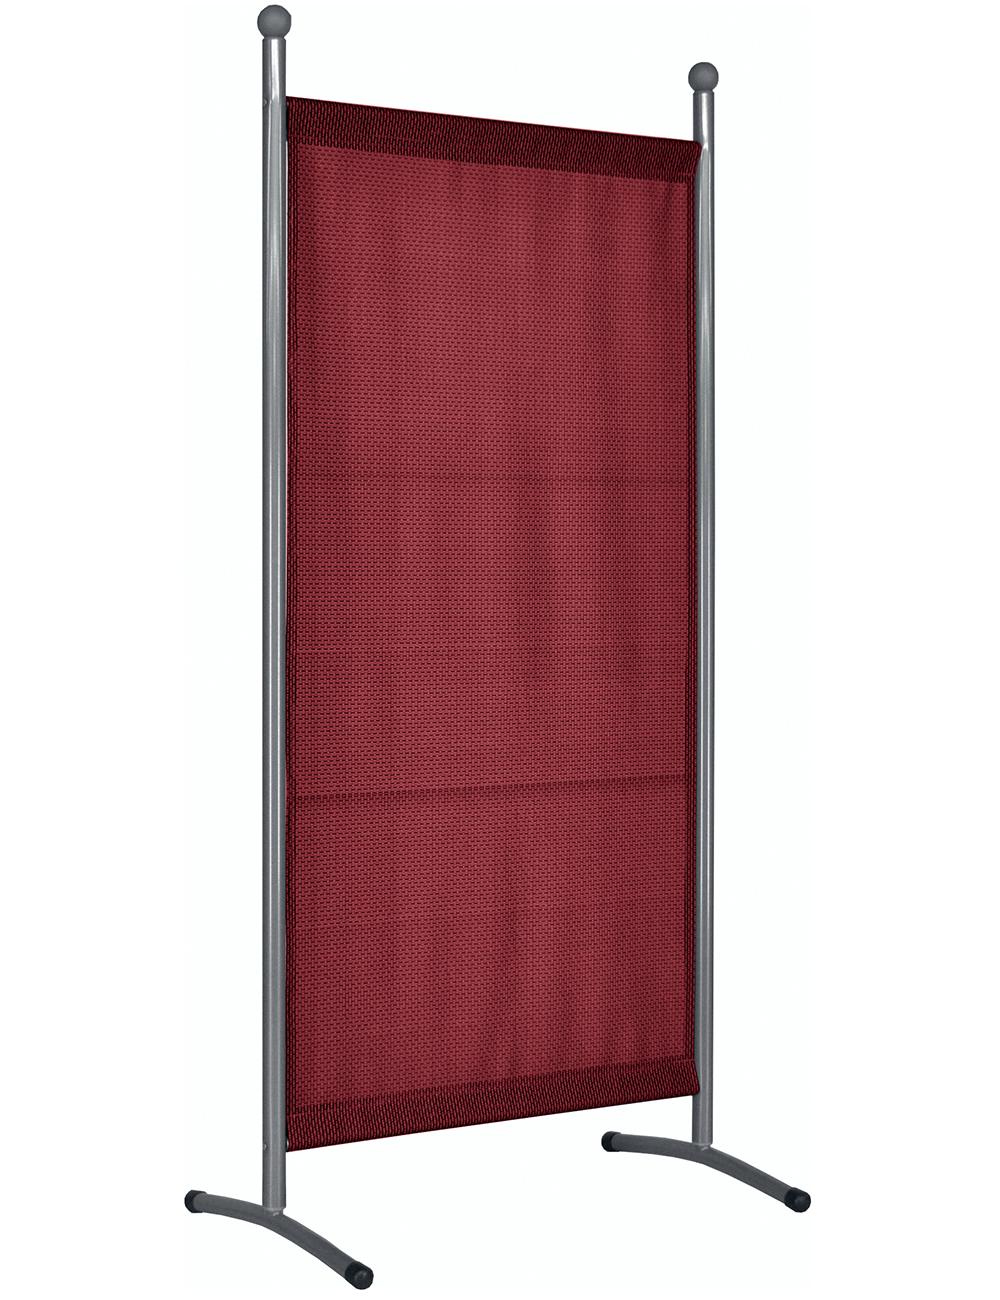 paravent 178 x 82 cm. Black Bedroom Furniture Sets. Home Design Ideas